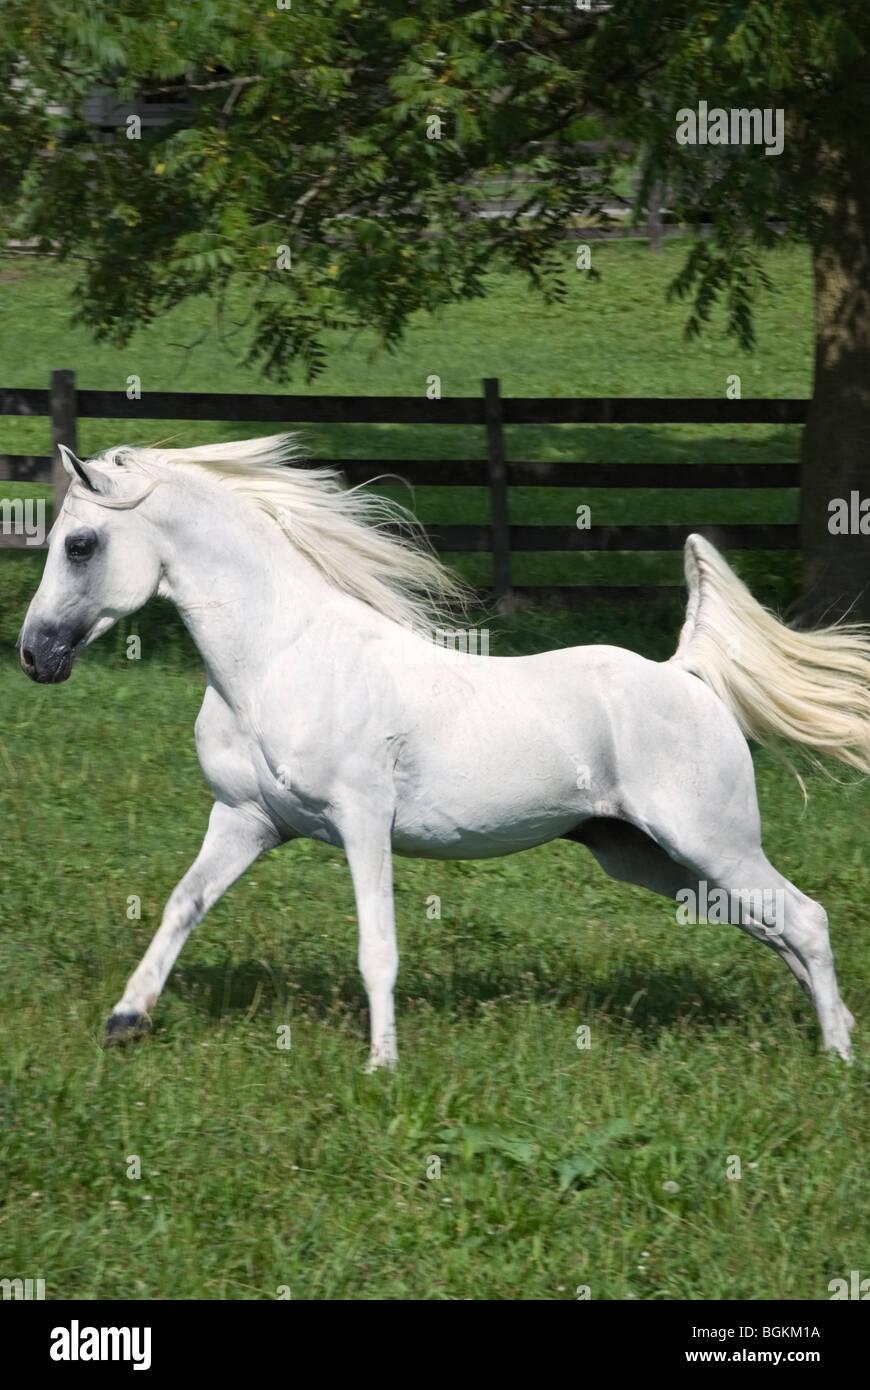 Stock Photo Of A White Arabian Stallion Running Across A Green Summer Stock Photo Alamy